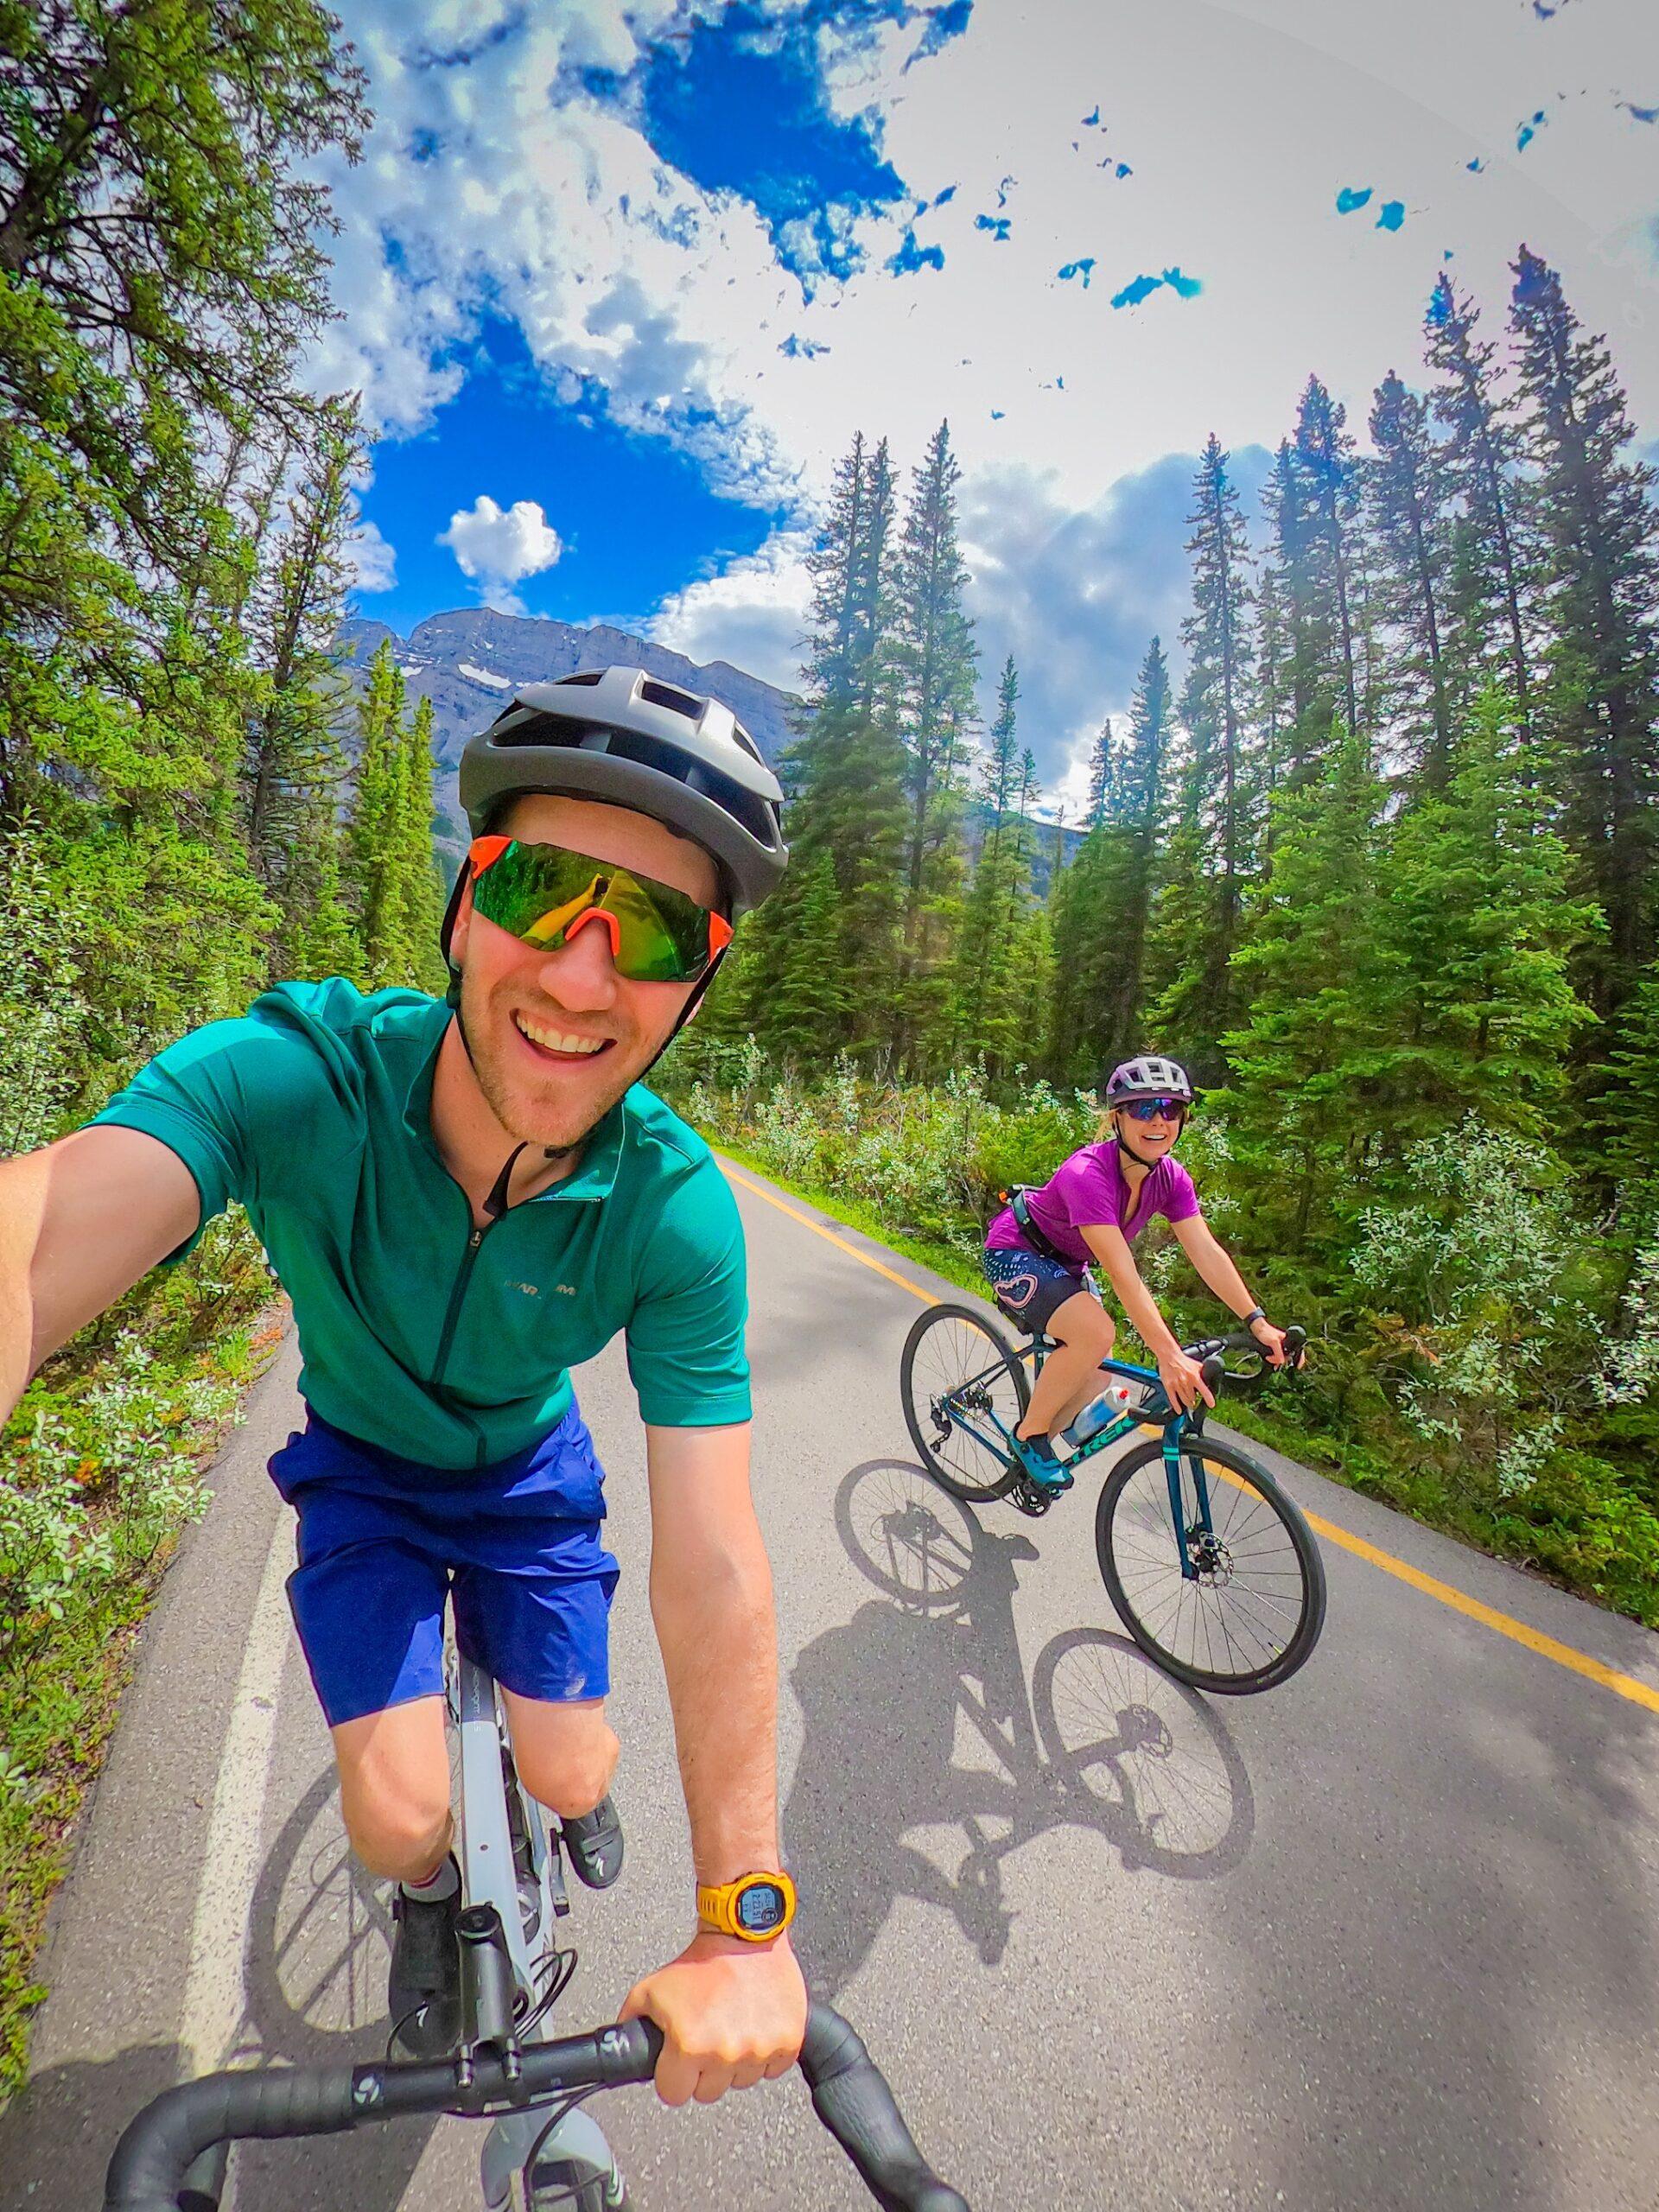 Garmin Smartwatch on A Gravel Bike Ride in Banff National Park